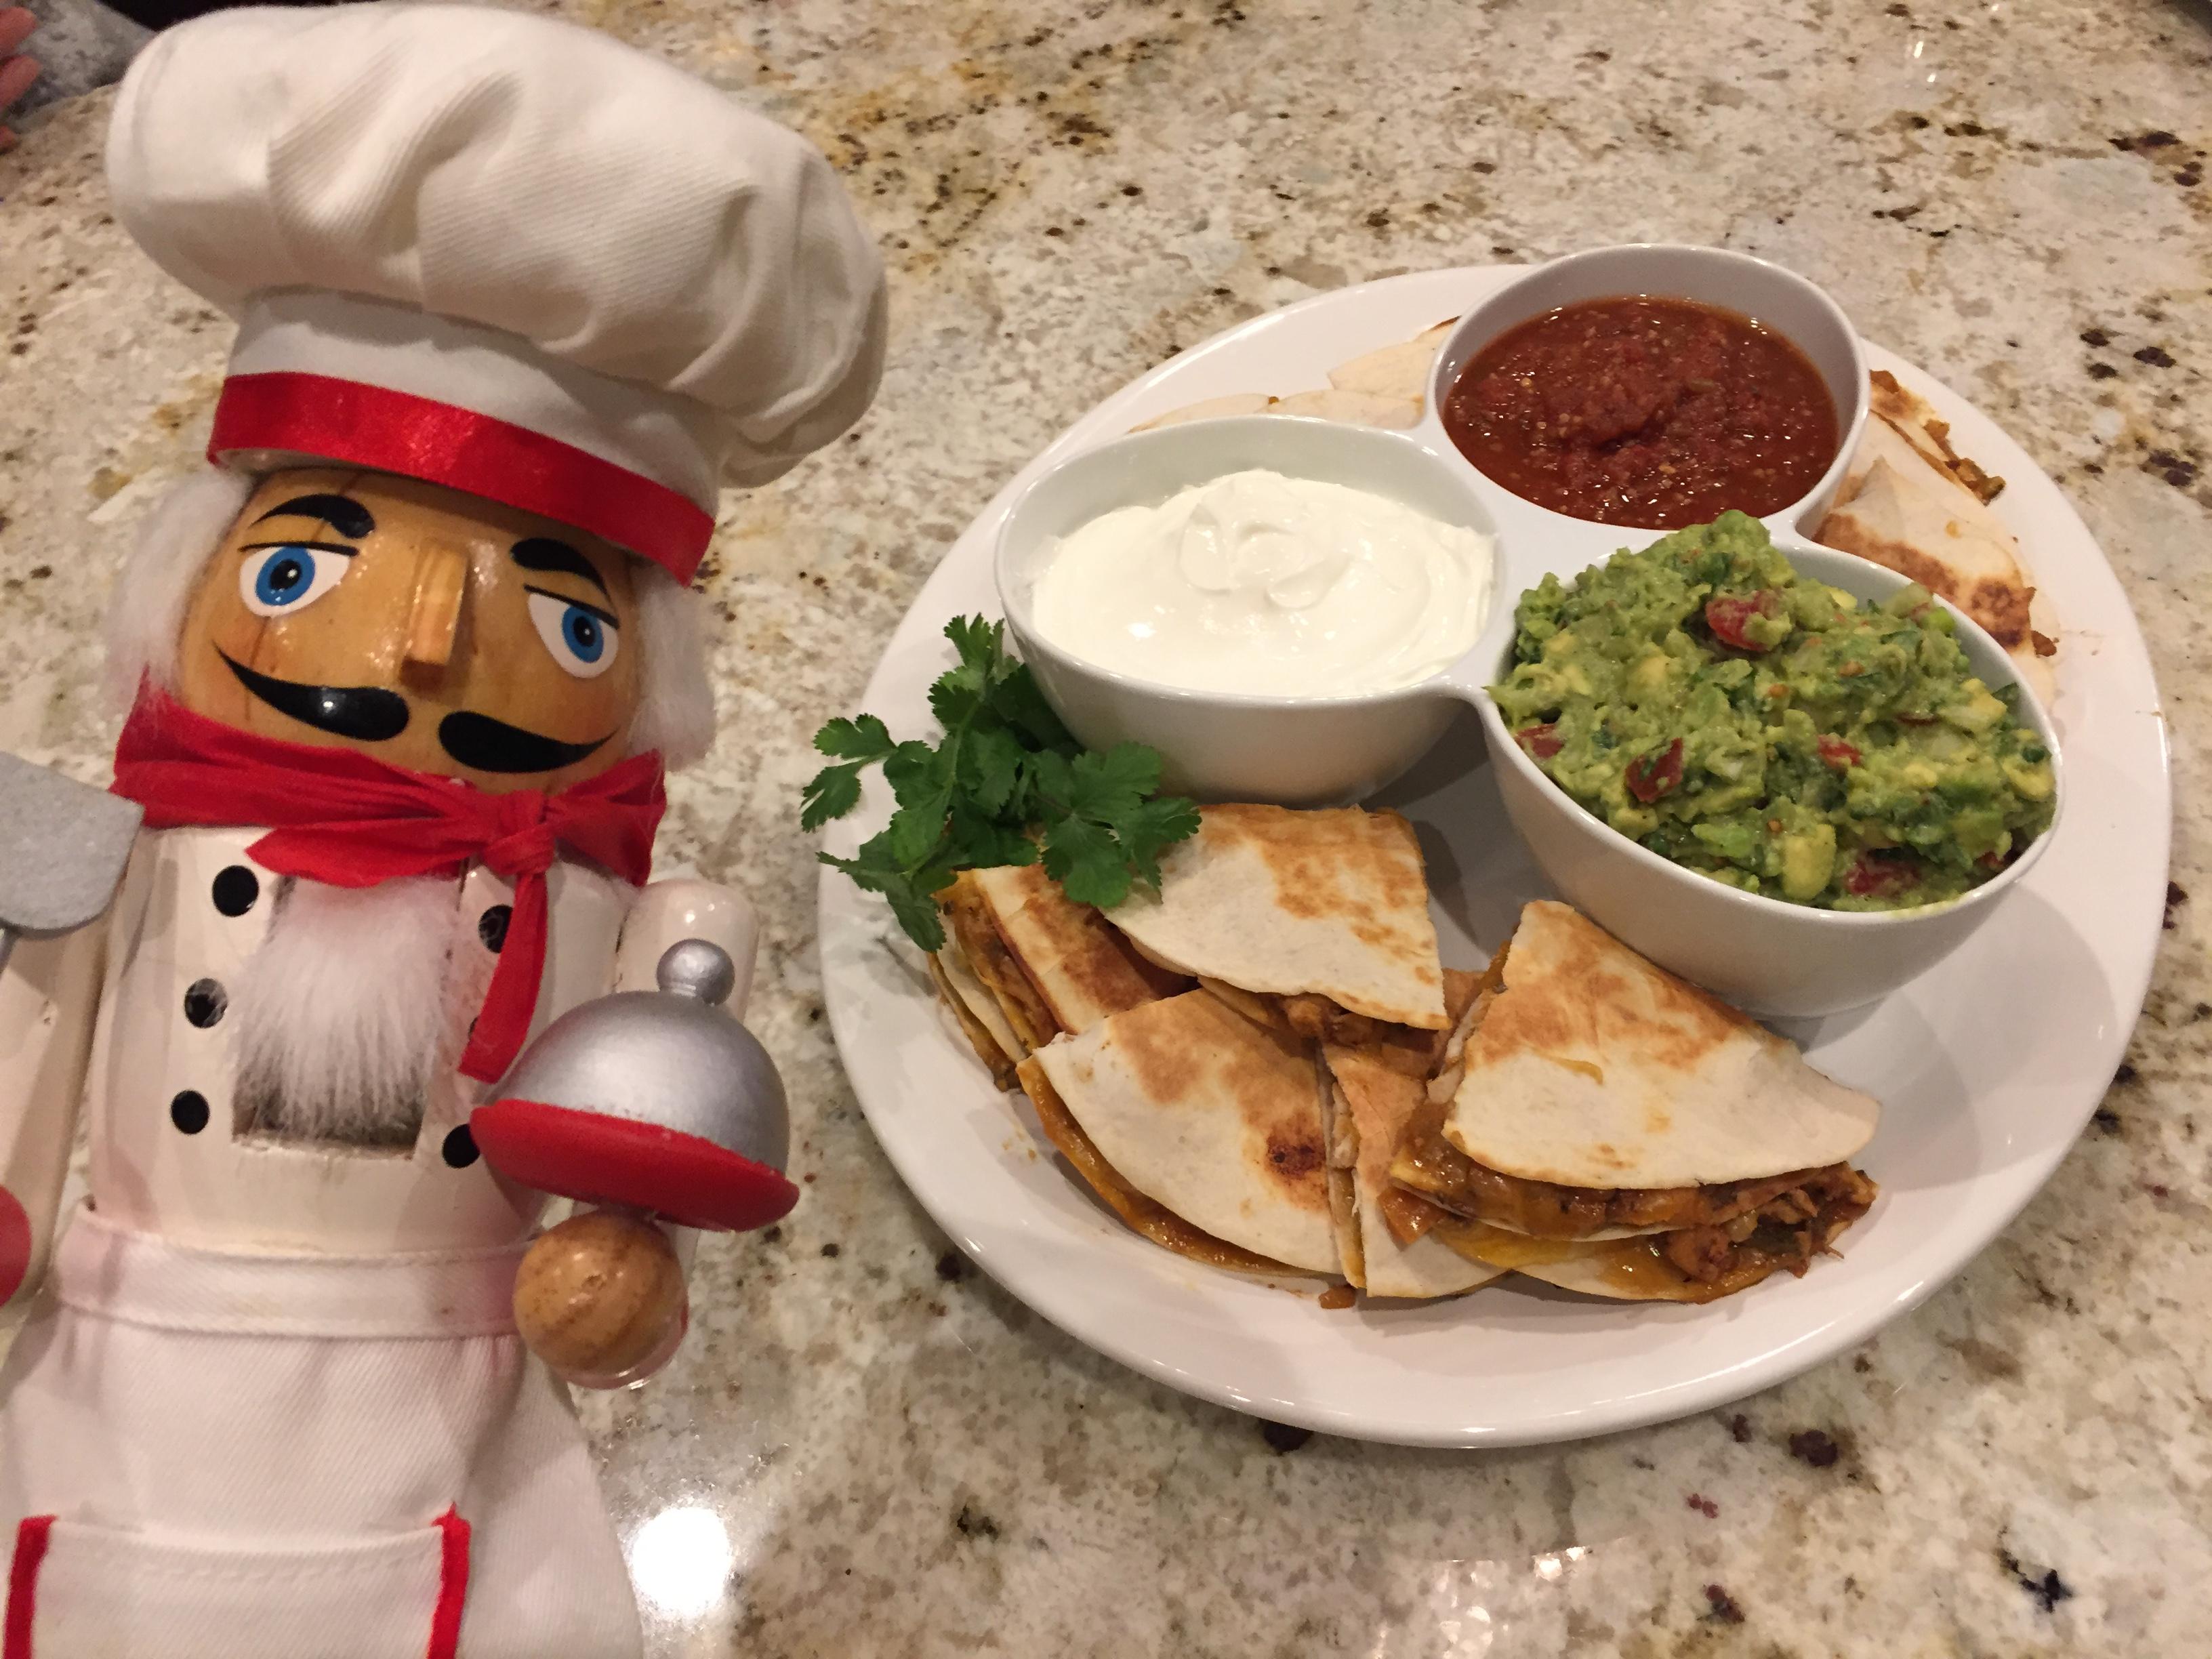 Pepe and Chicken quesadilla platter